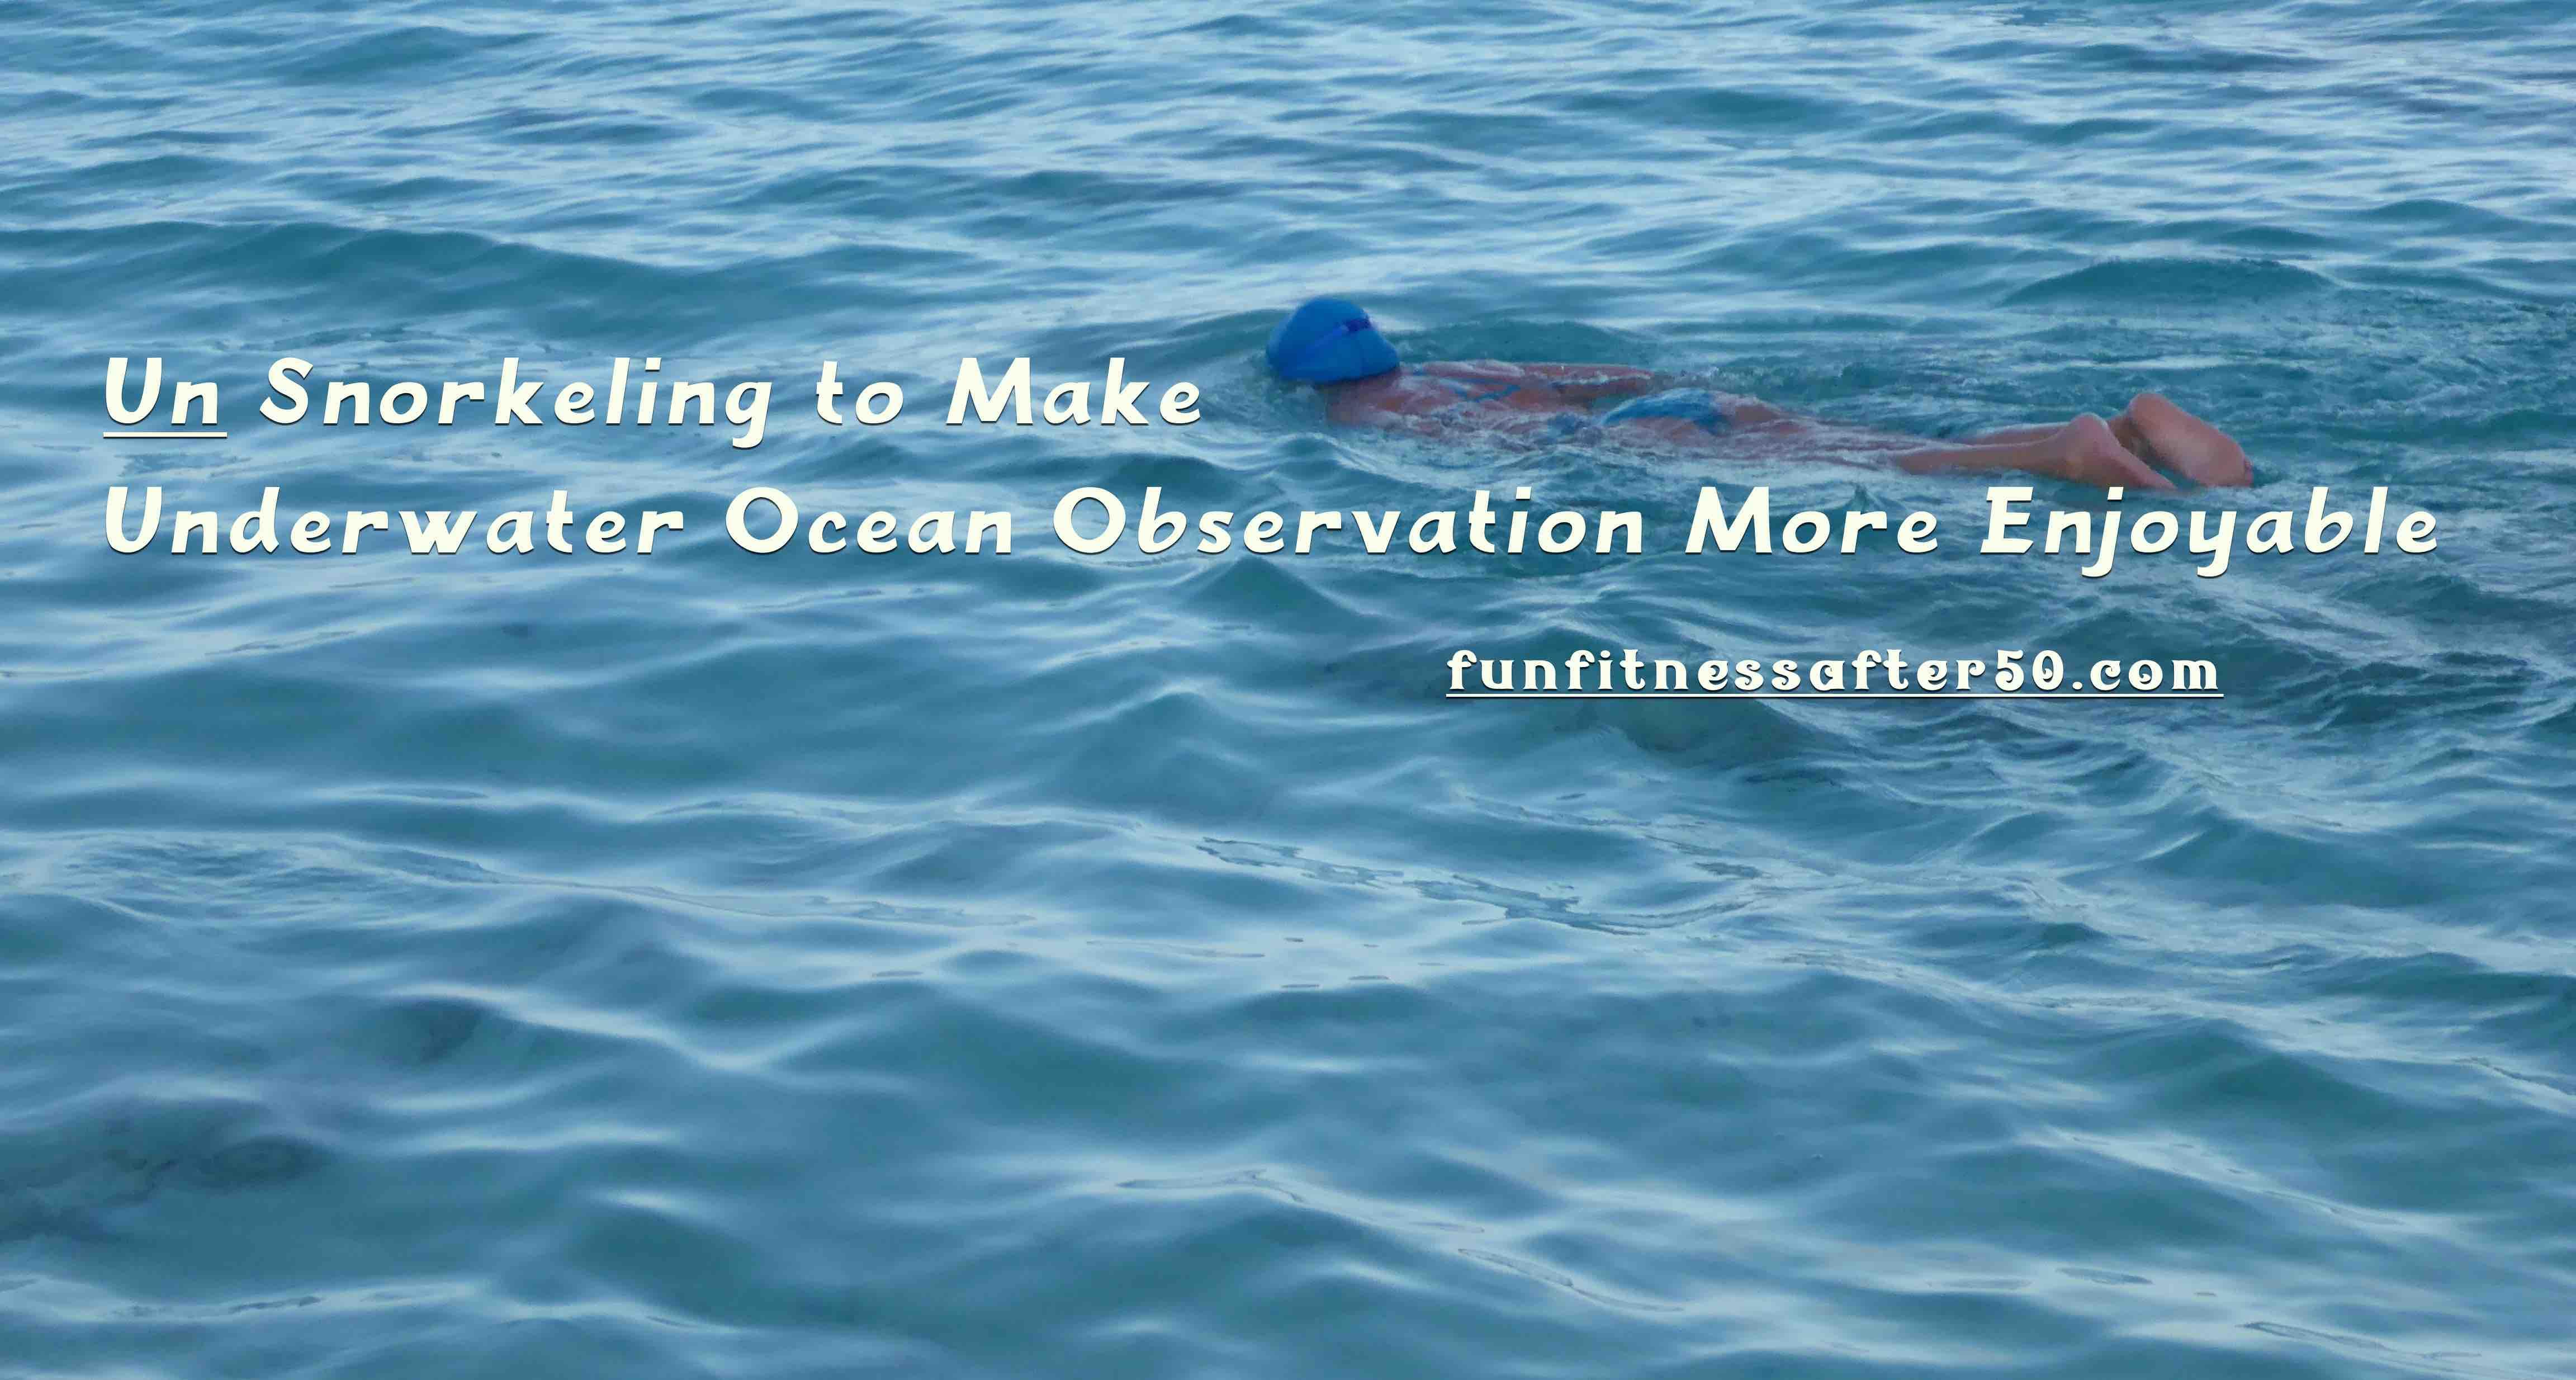 Un Snorkeling To Make Underwater Ocean Observation More